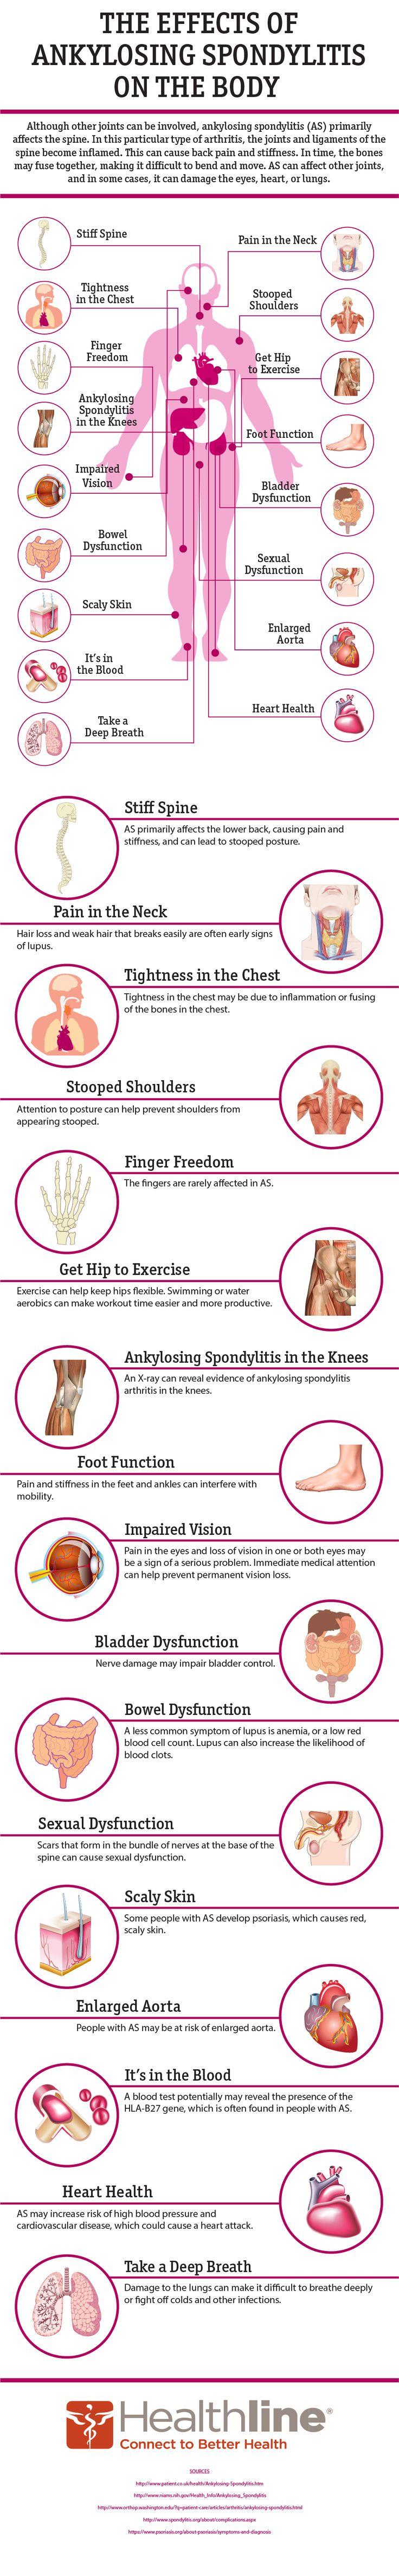 The Effects of Ankylosing Spondylitis on the Body #AnkylosingSpondylitis #autoimmune